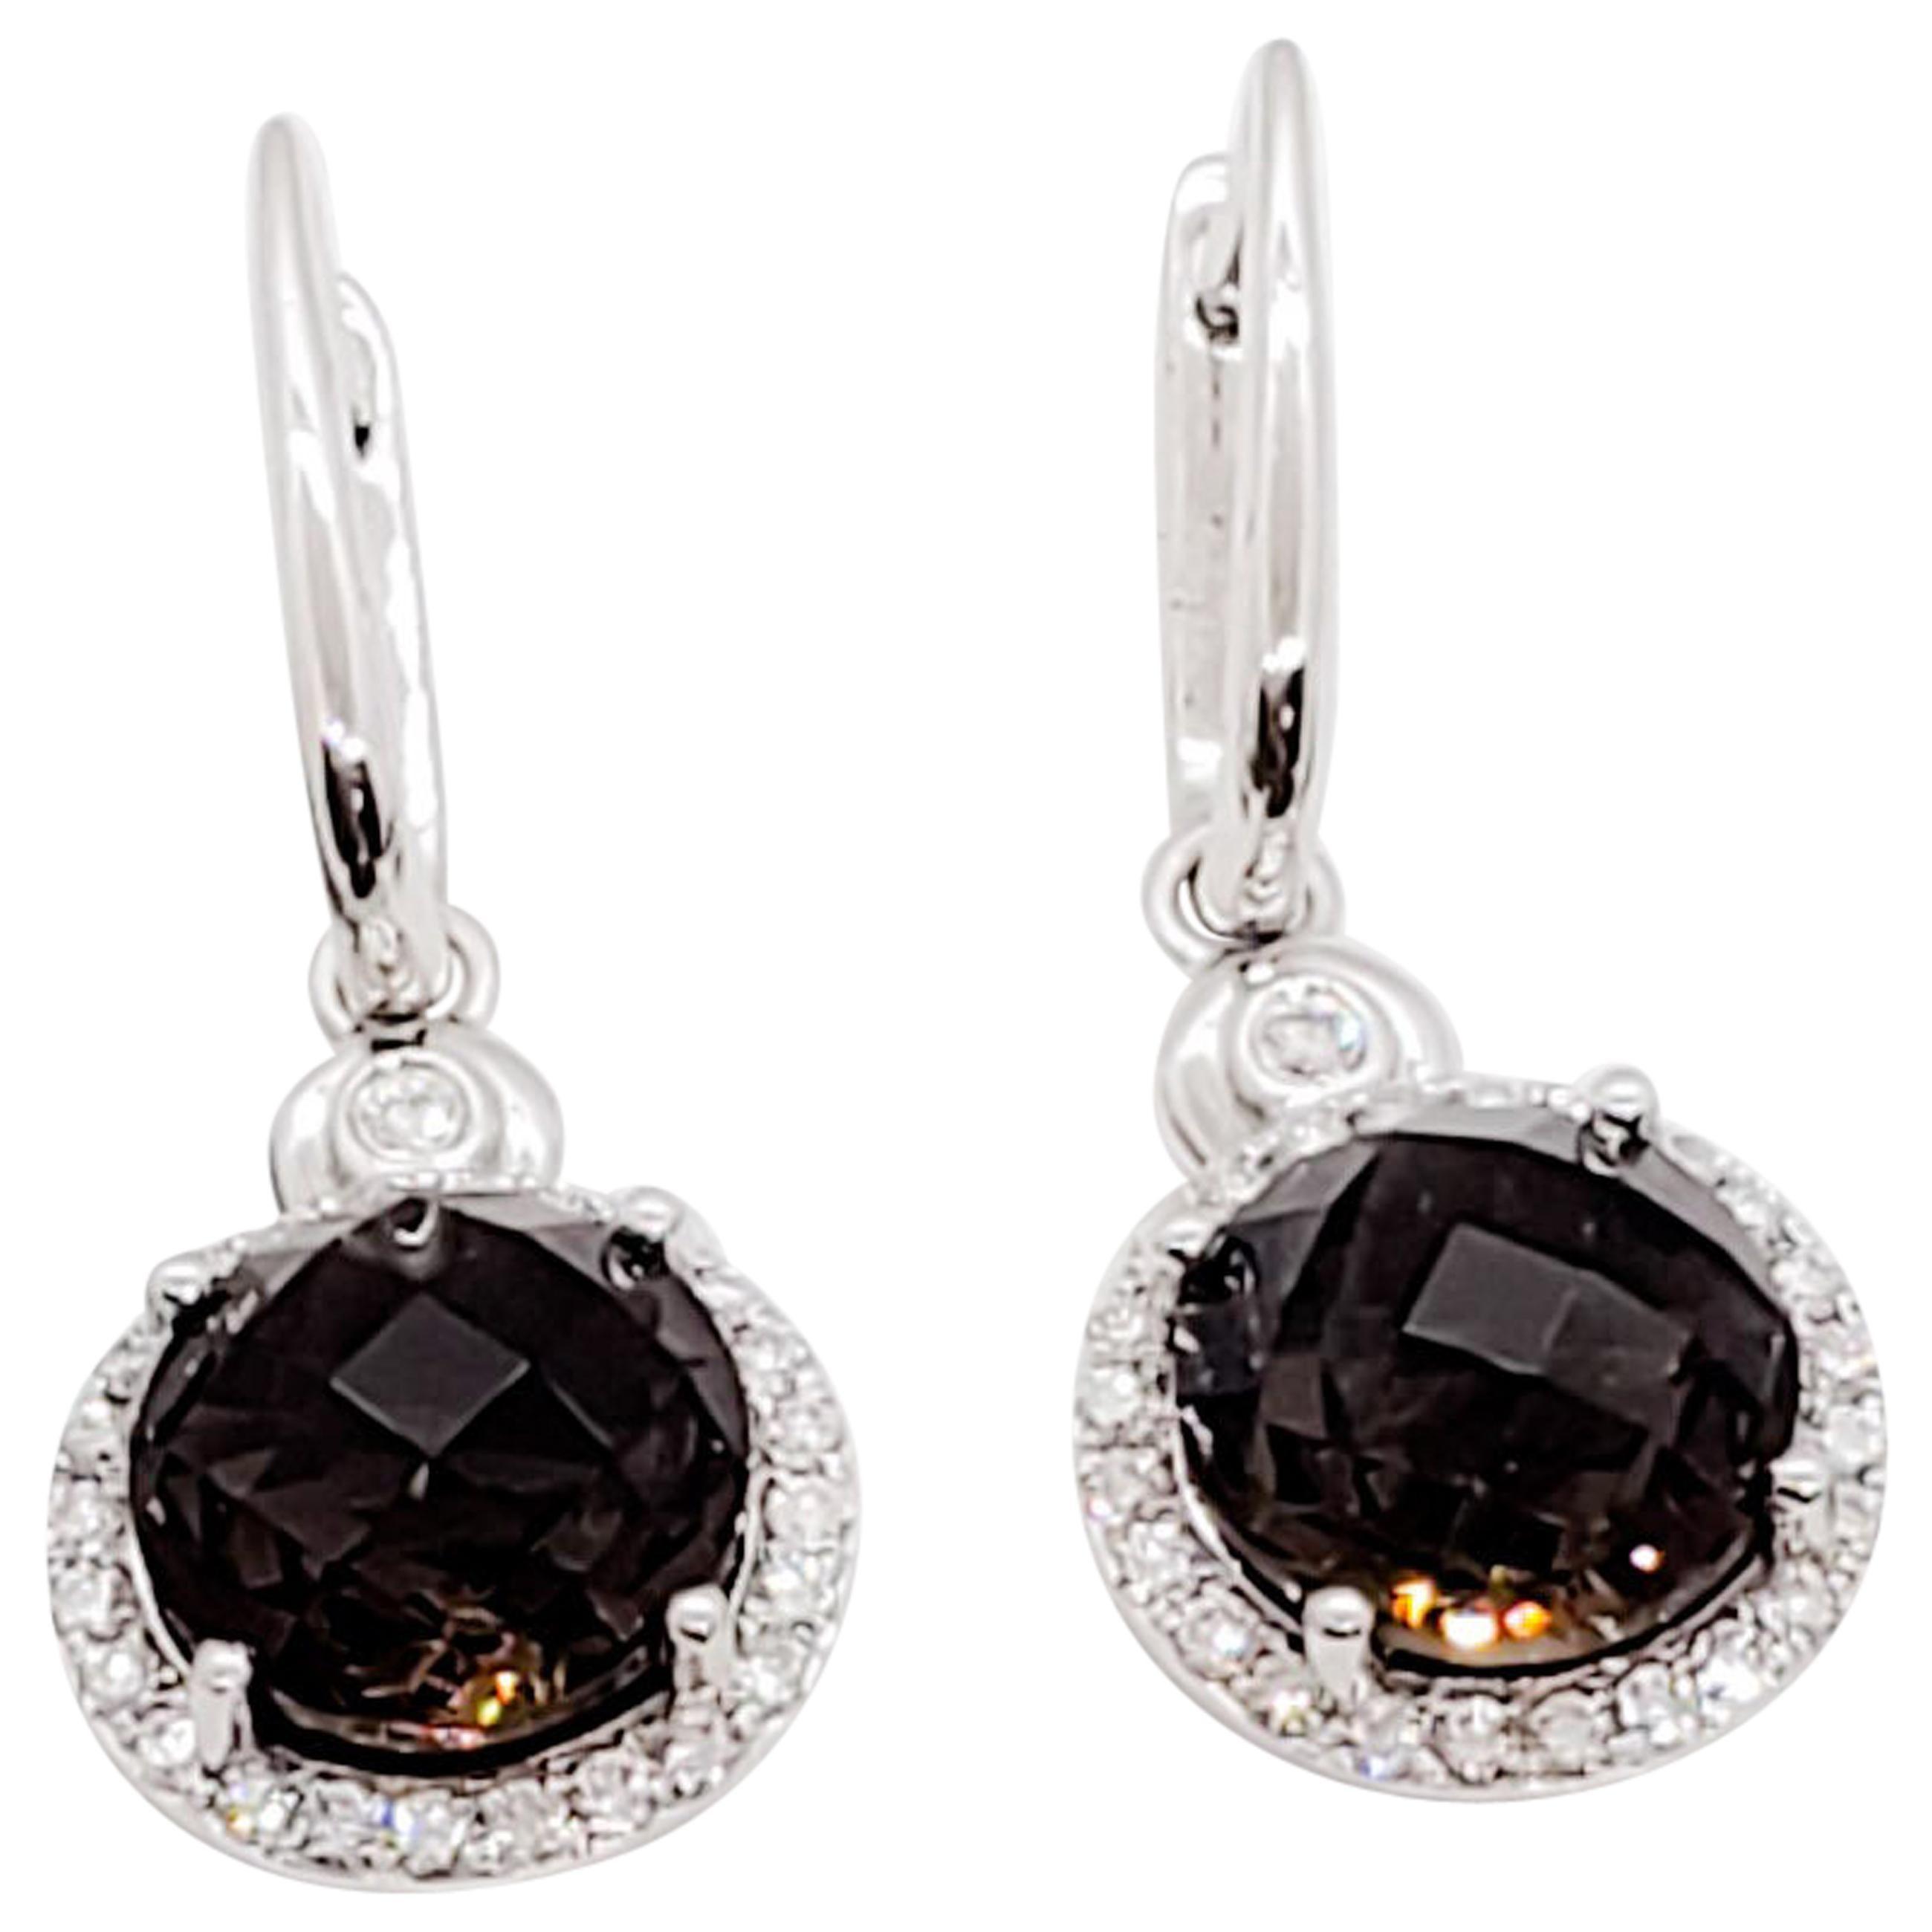 Smoky Quartz Round Dangle Earrings with White Diamonds in 14 Karat White Gold